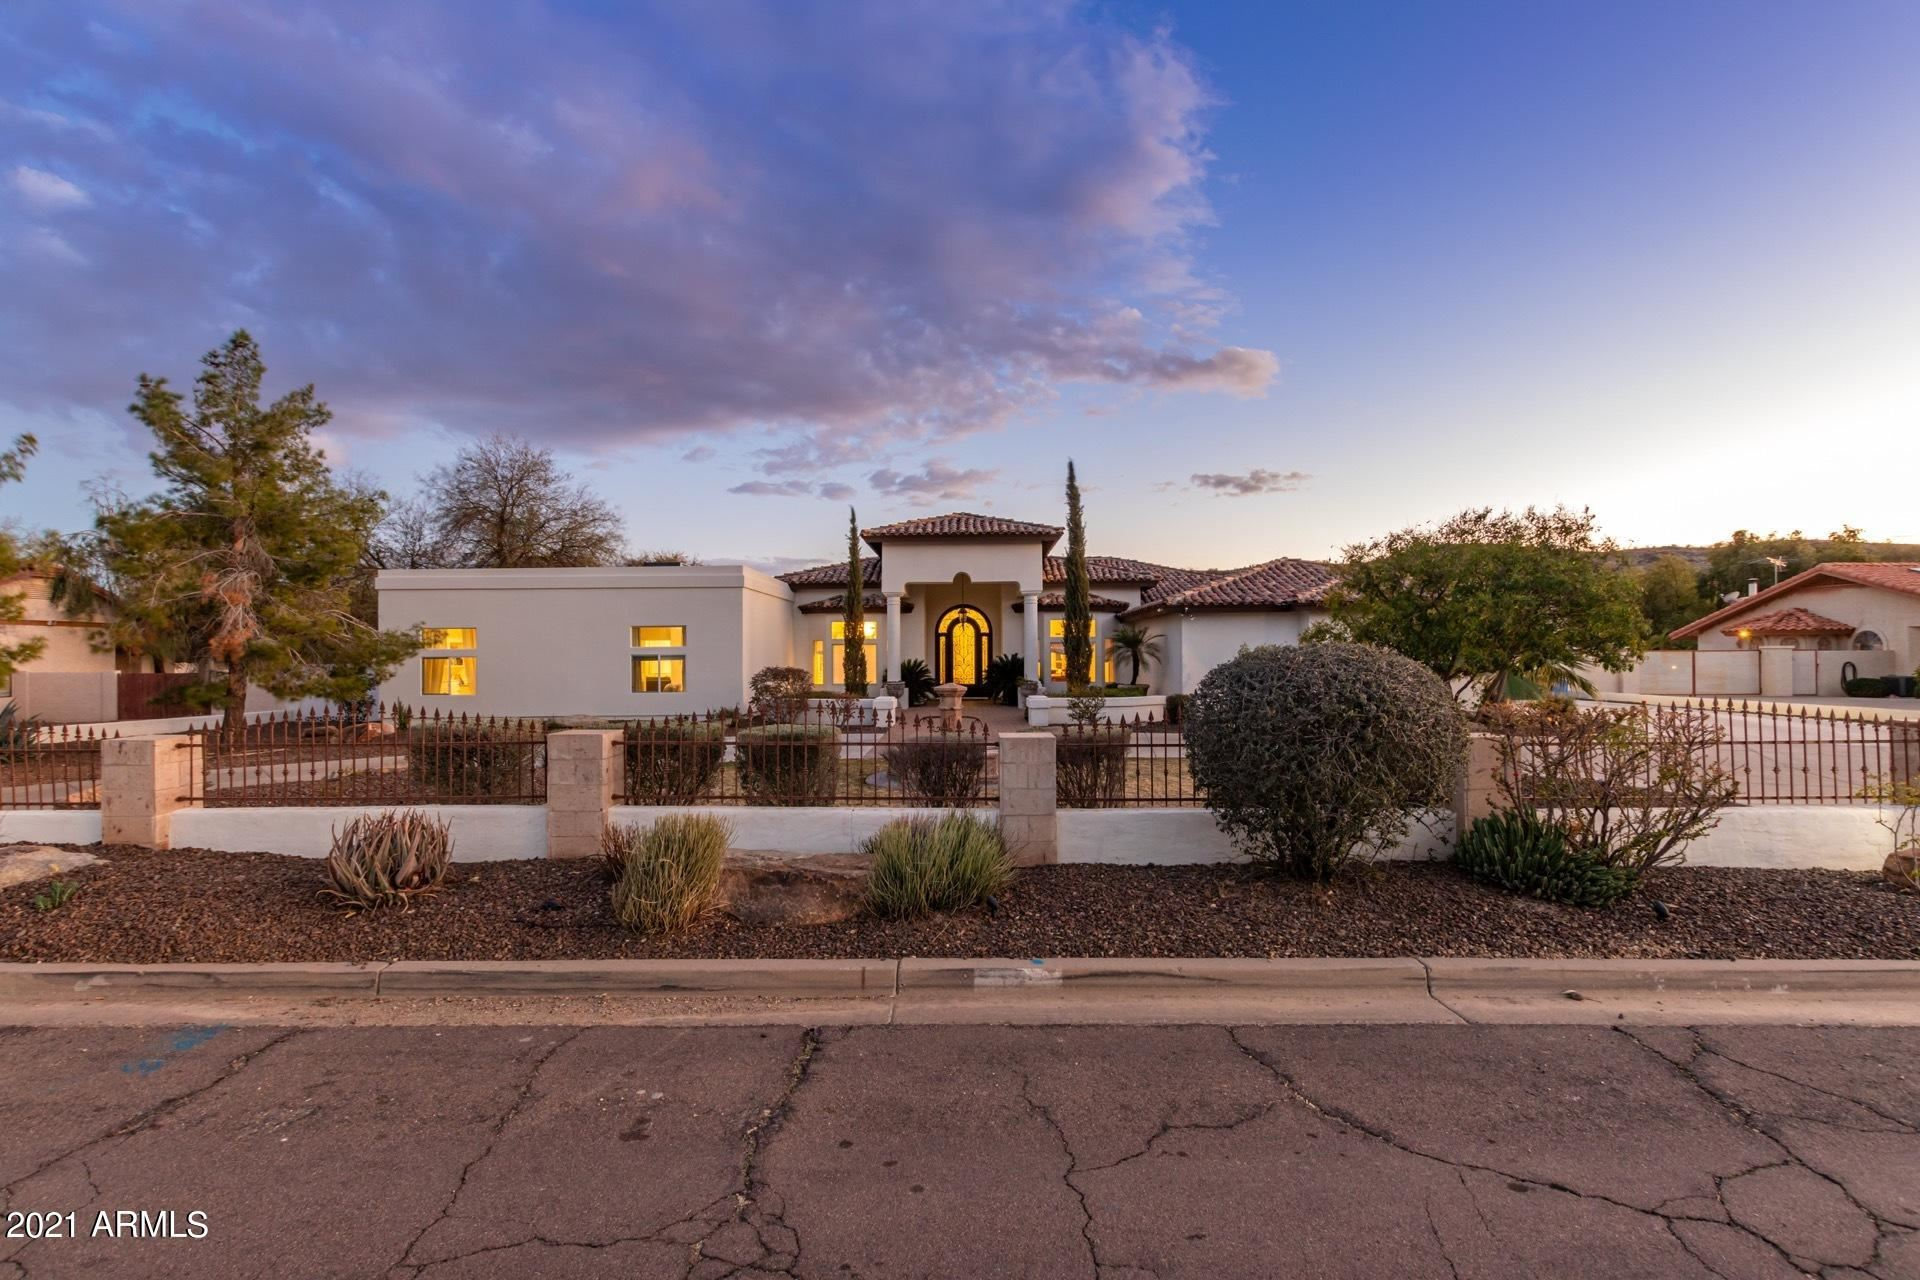 5537 W ALAMEDA Road, Glendale, AZ 85310 - MLS#: 6193333